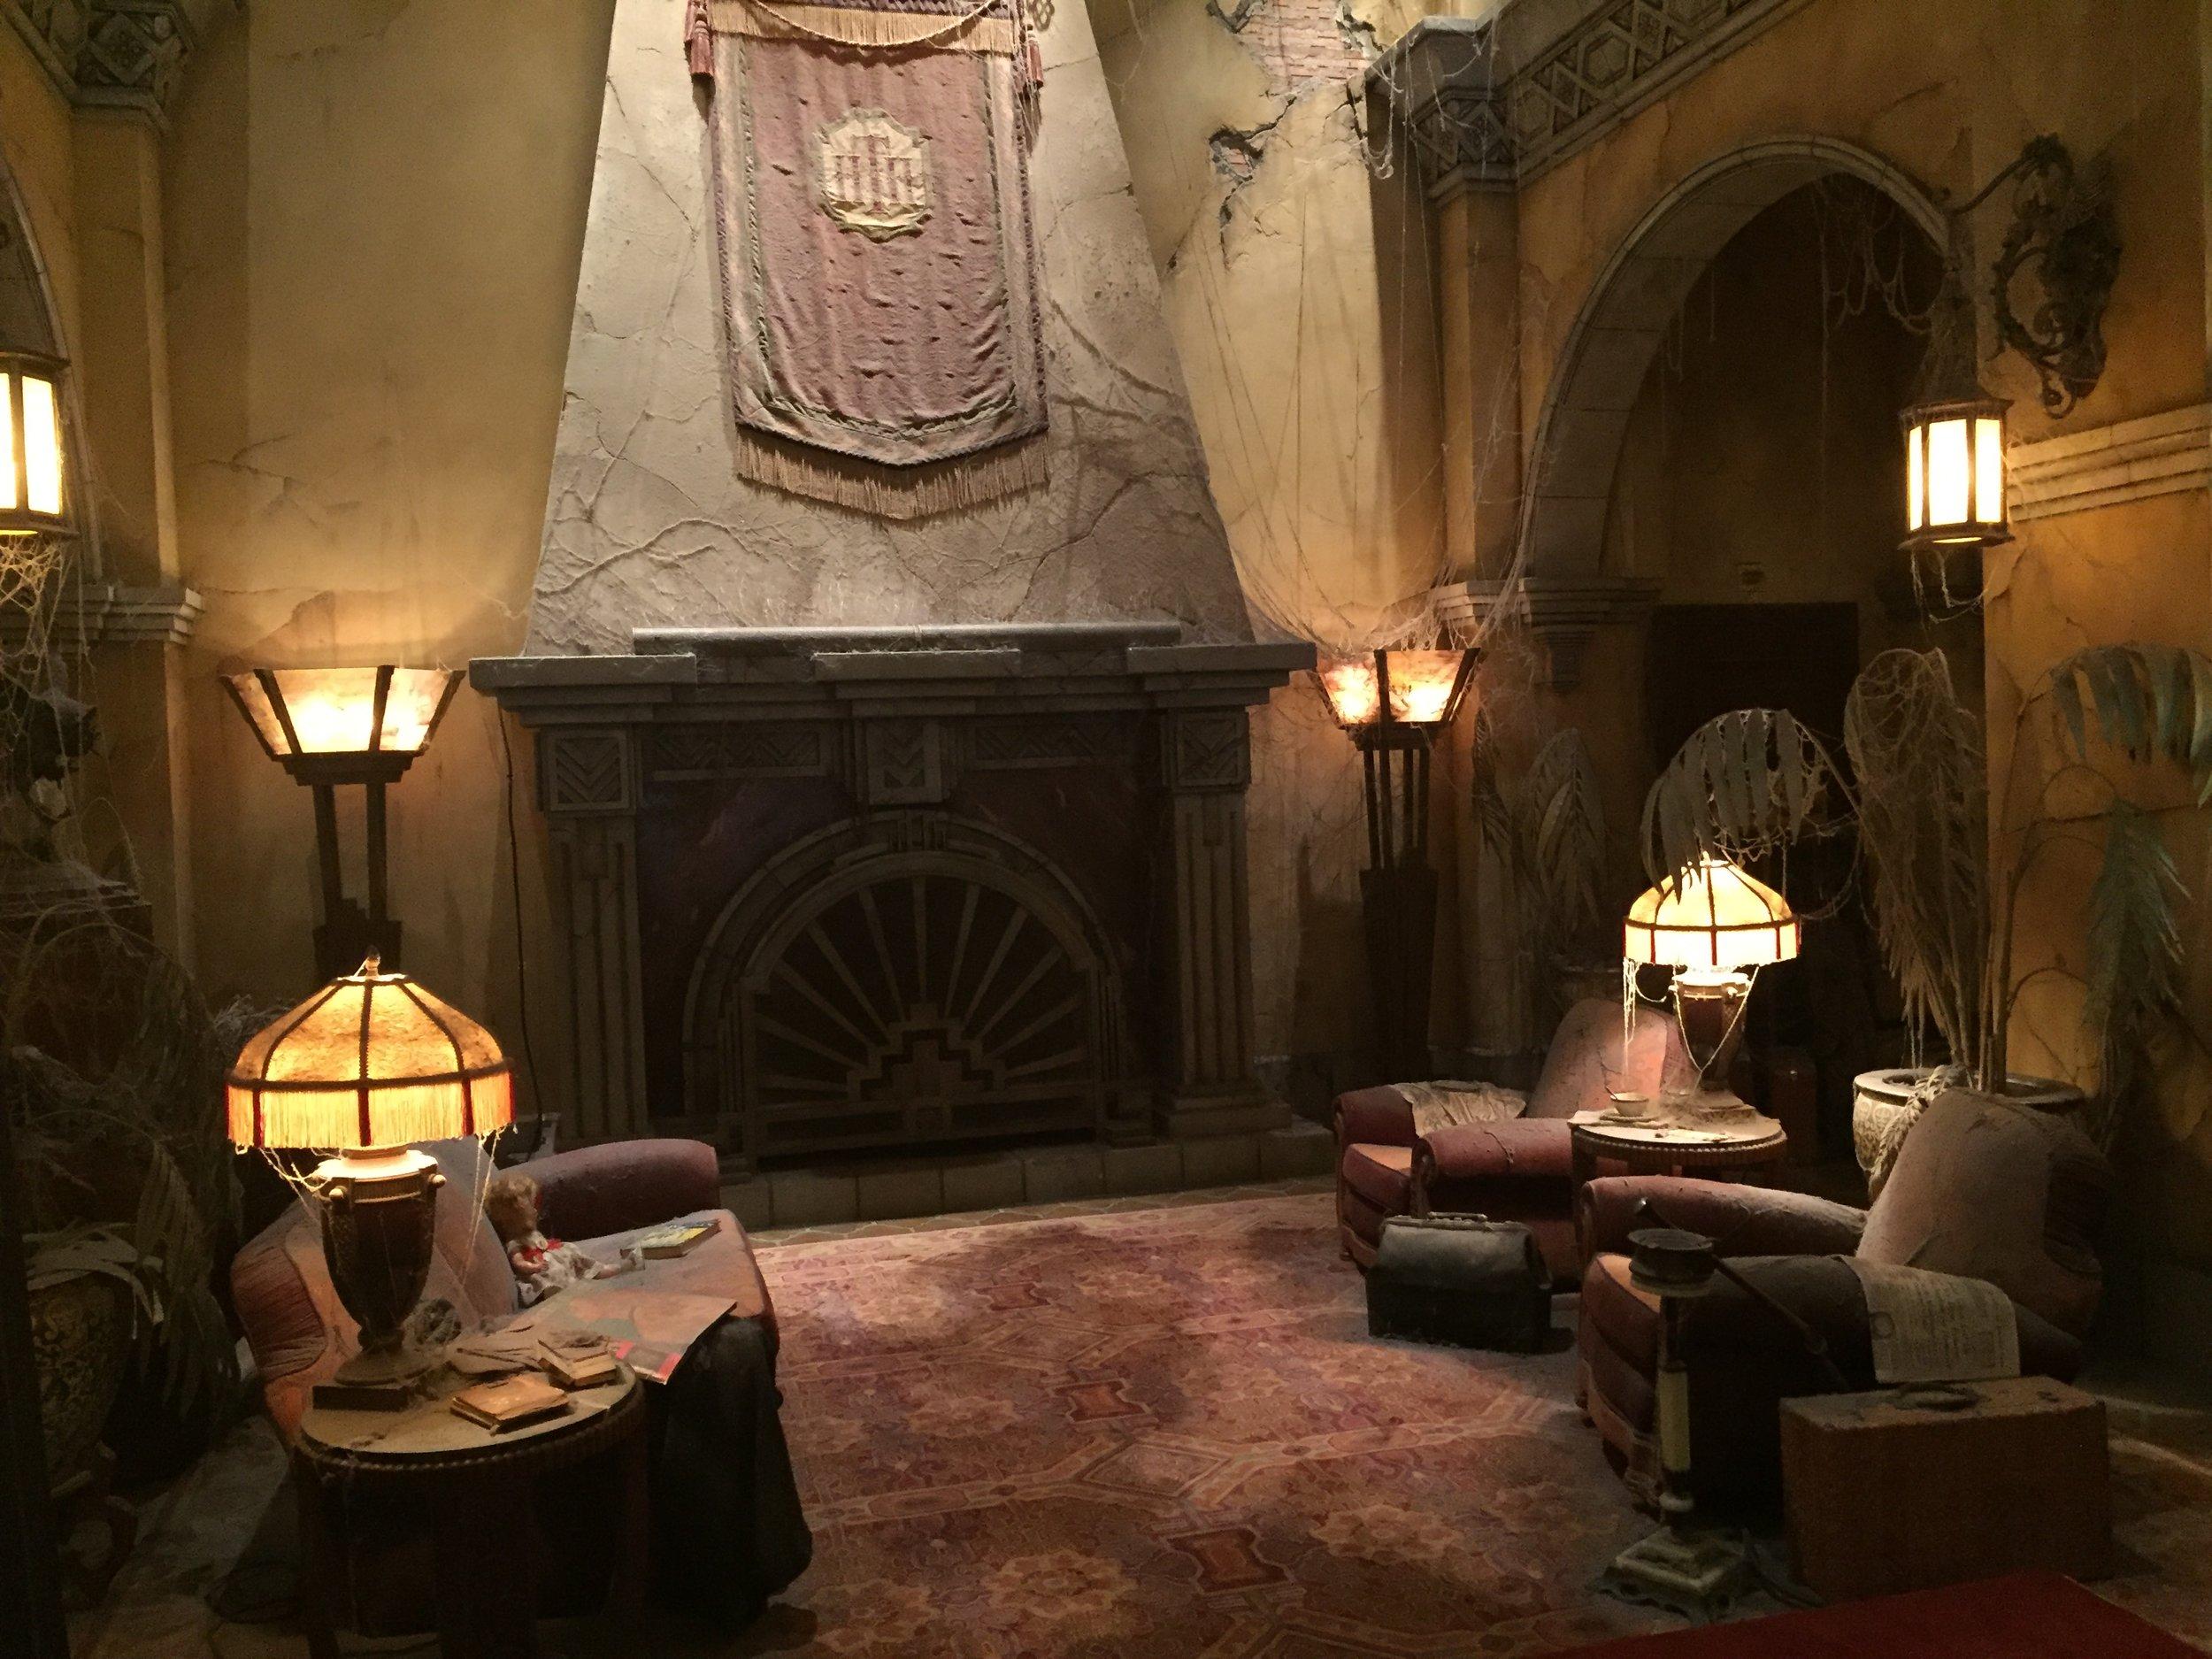 Last day of Tower of Terror in Disney's California Adventure